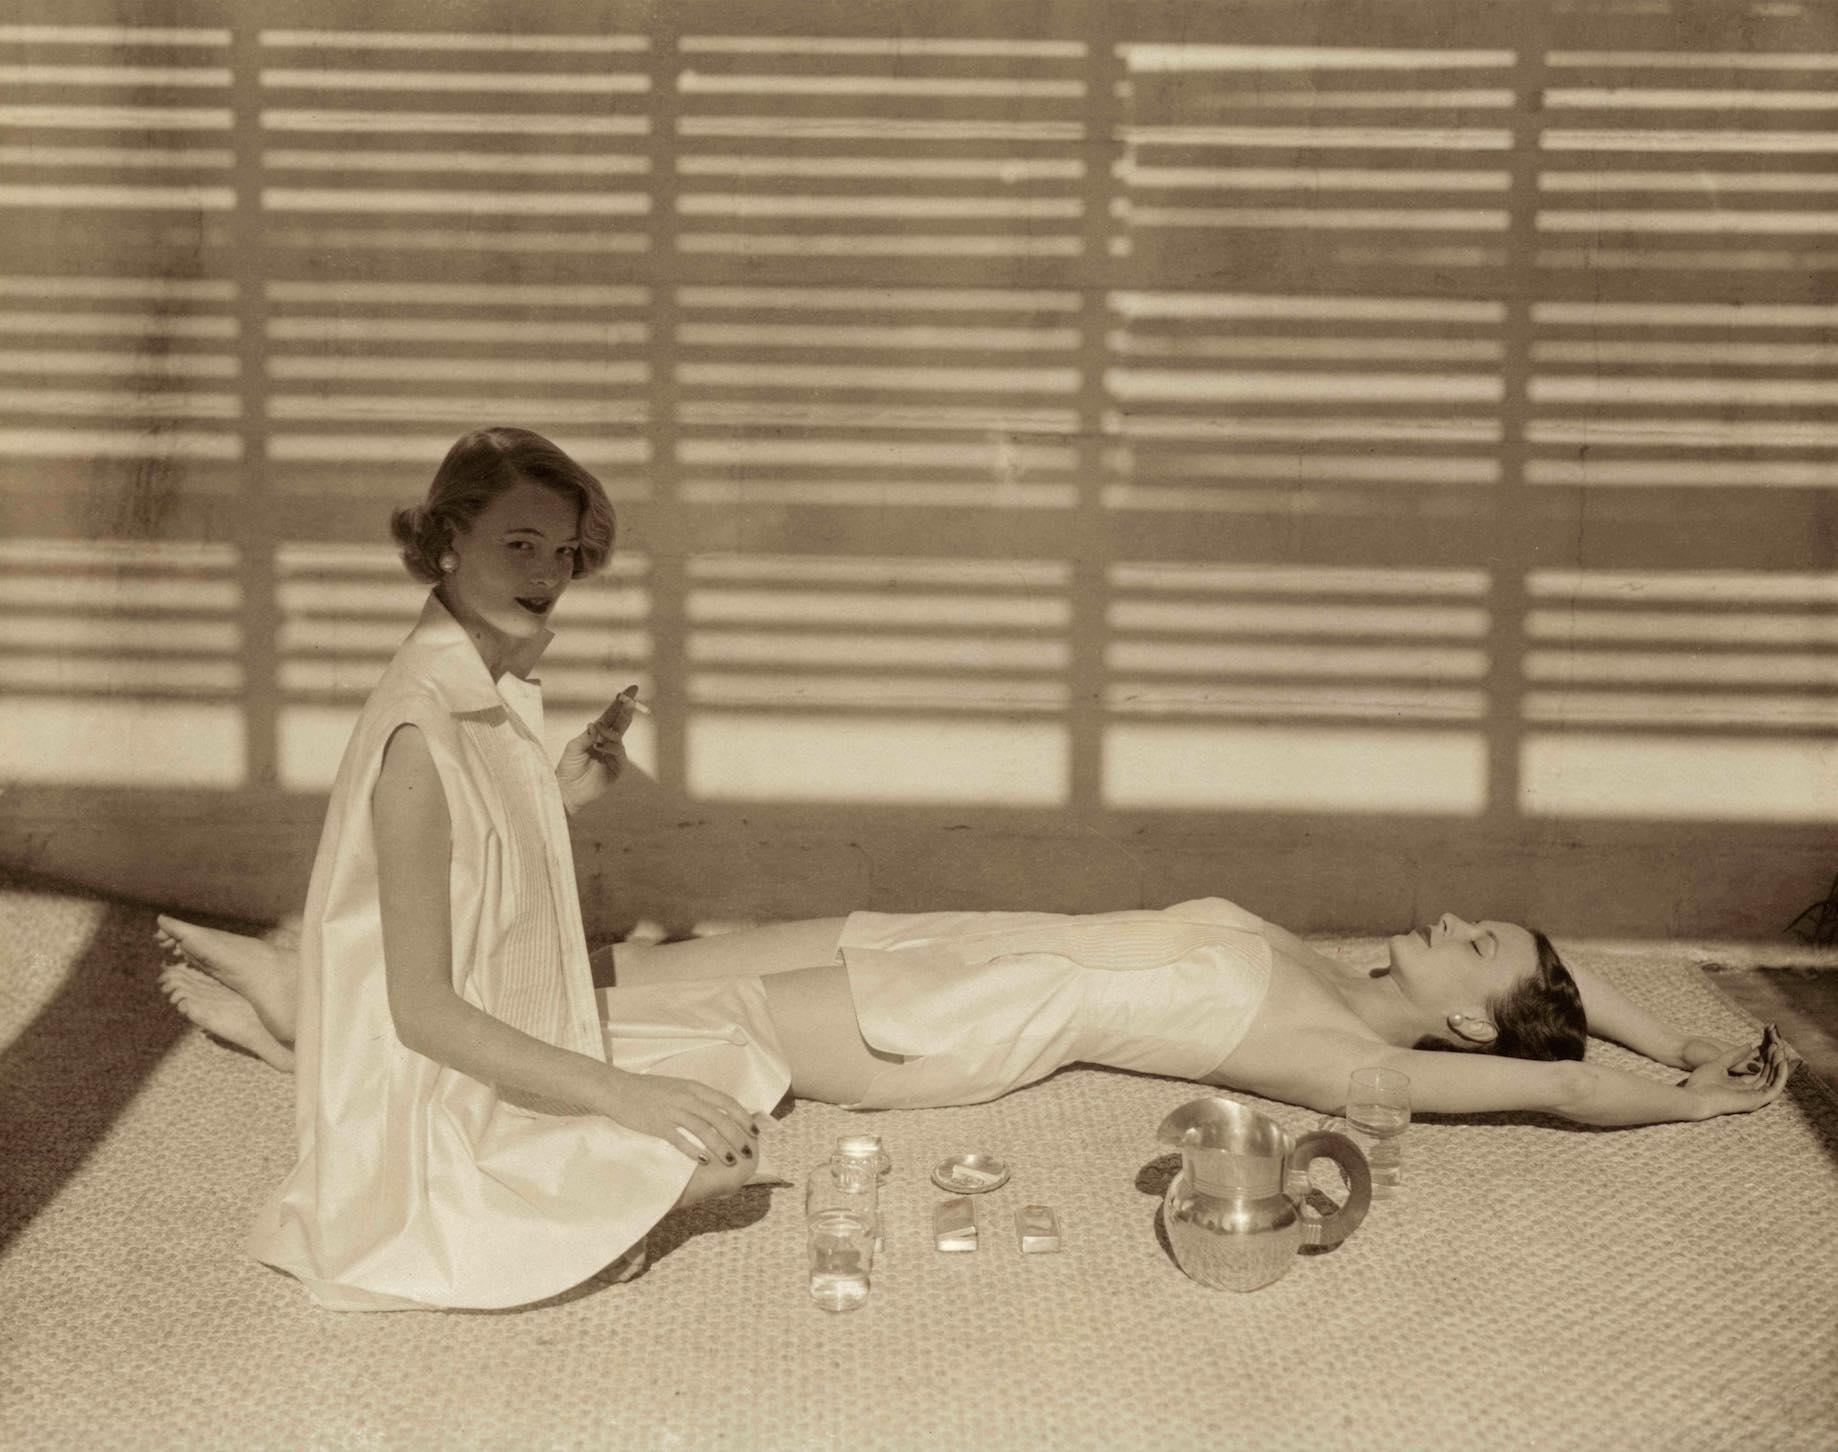 Horst P. Horst, Lisette Model, Roberto Gabetti: la ripartenza di CAMERA, Torino